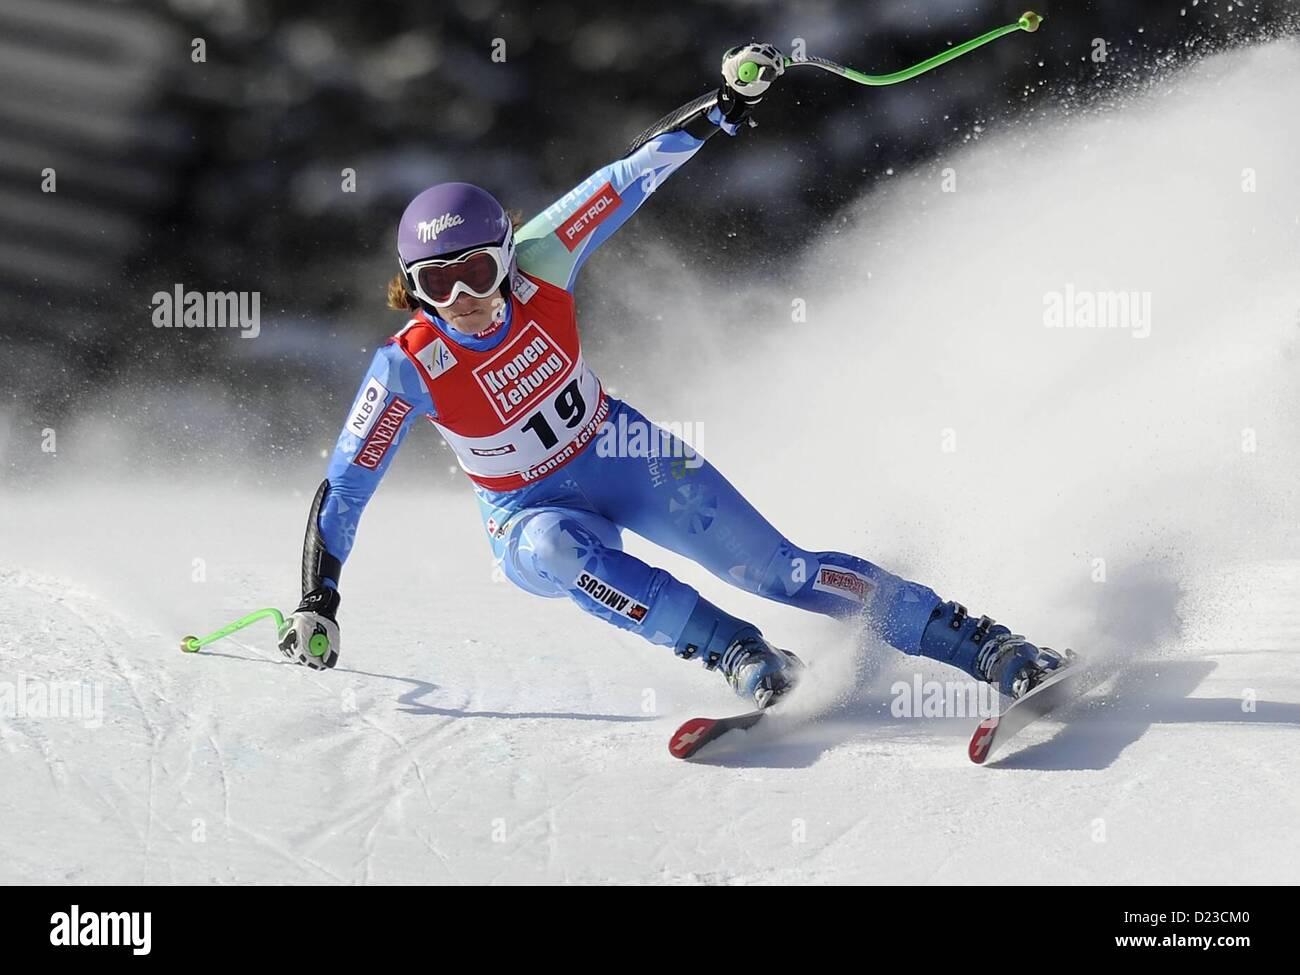 St Anton, Austria. 13th Jan, 2013.   Ski Alpine FIS World Cup Super G for women Tina Maze SLO - Stock Image